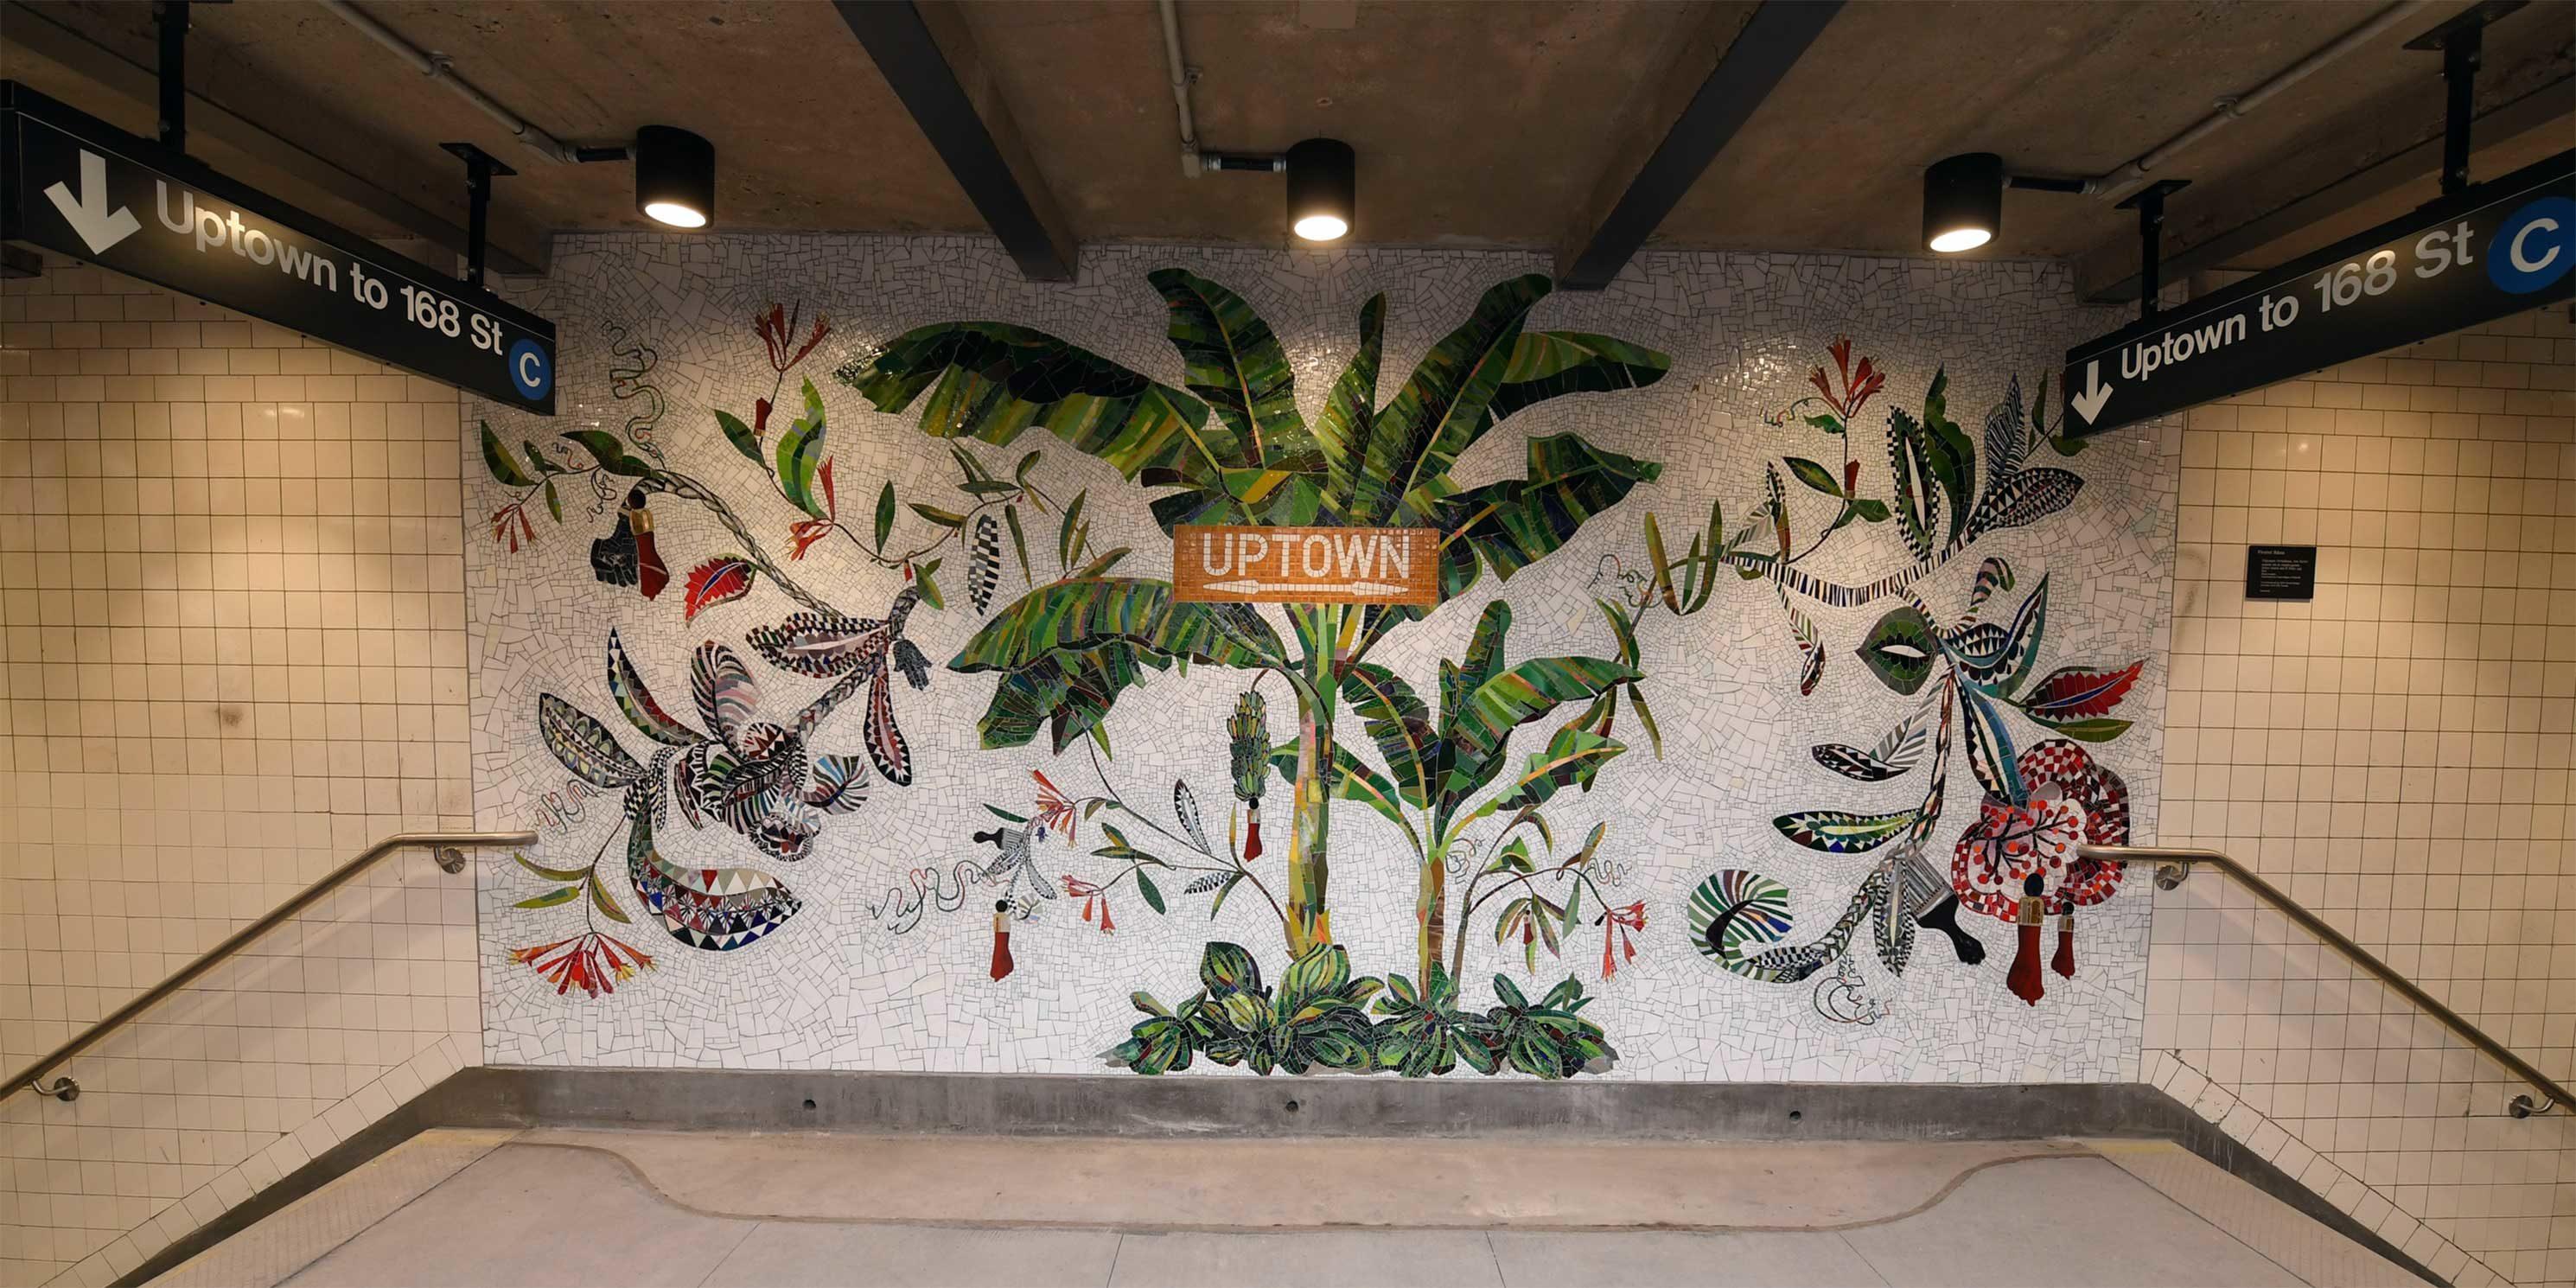 tile mural in subway station